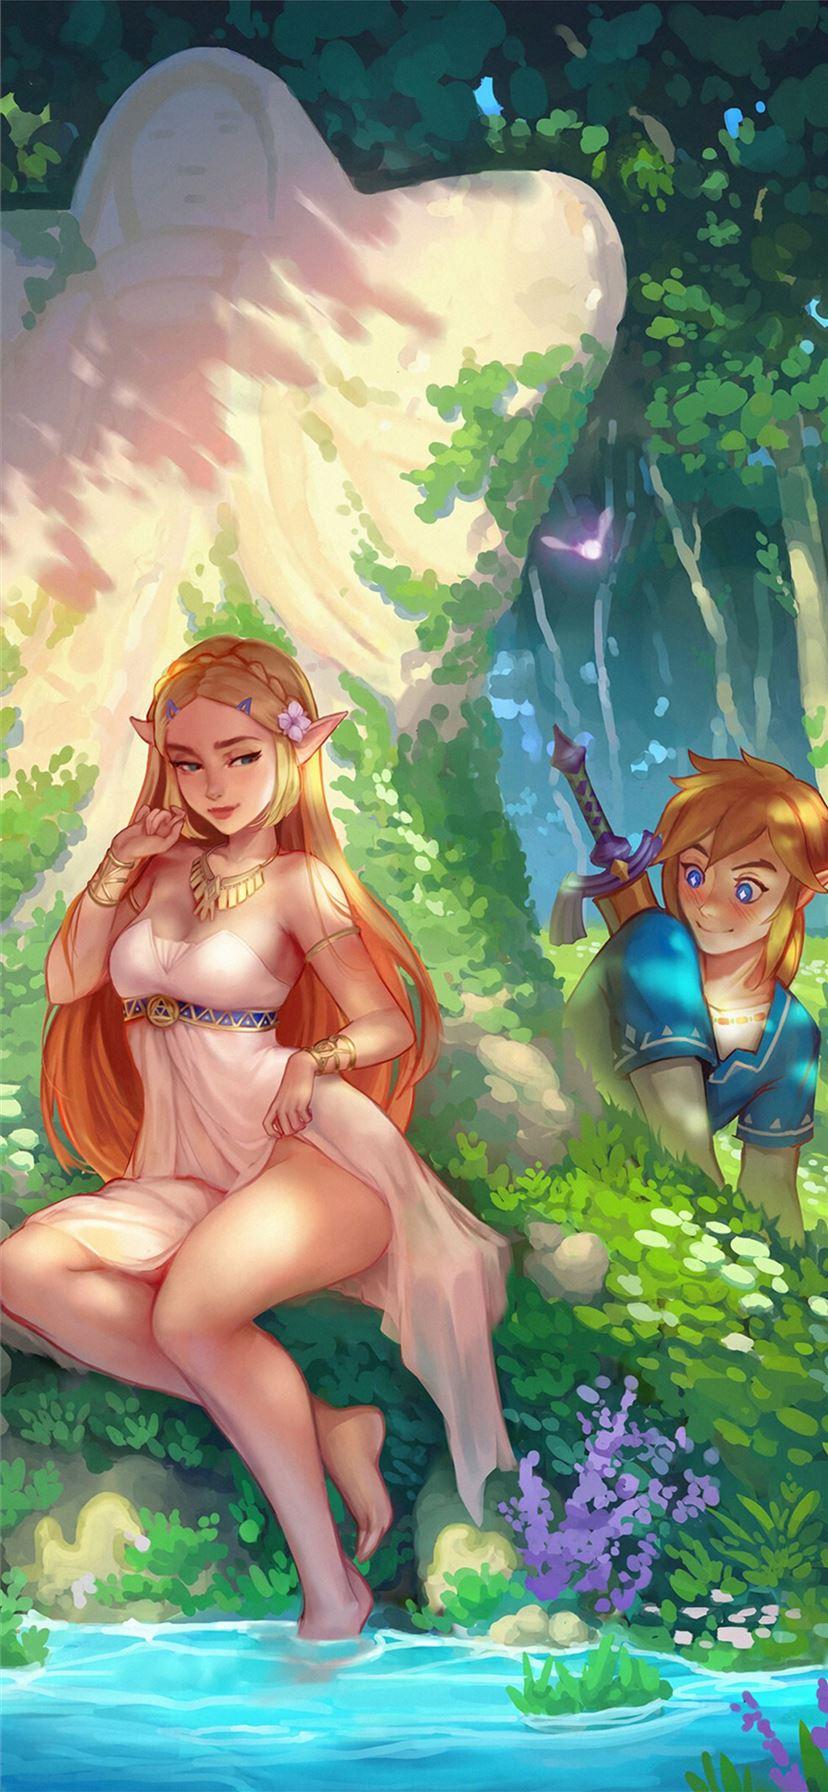 The Legend Of Zelda Video Game 4k Iphone 11 Wallpapers Free Download